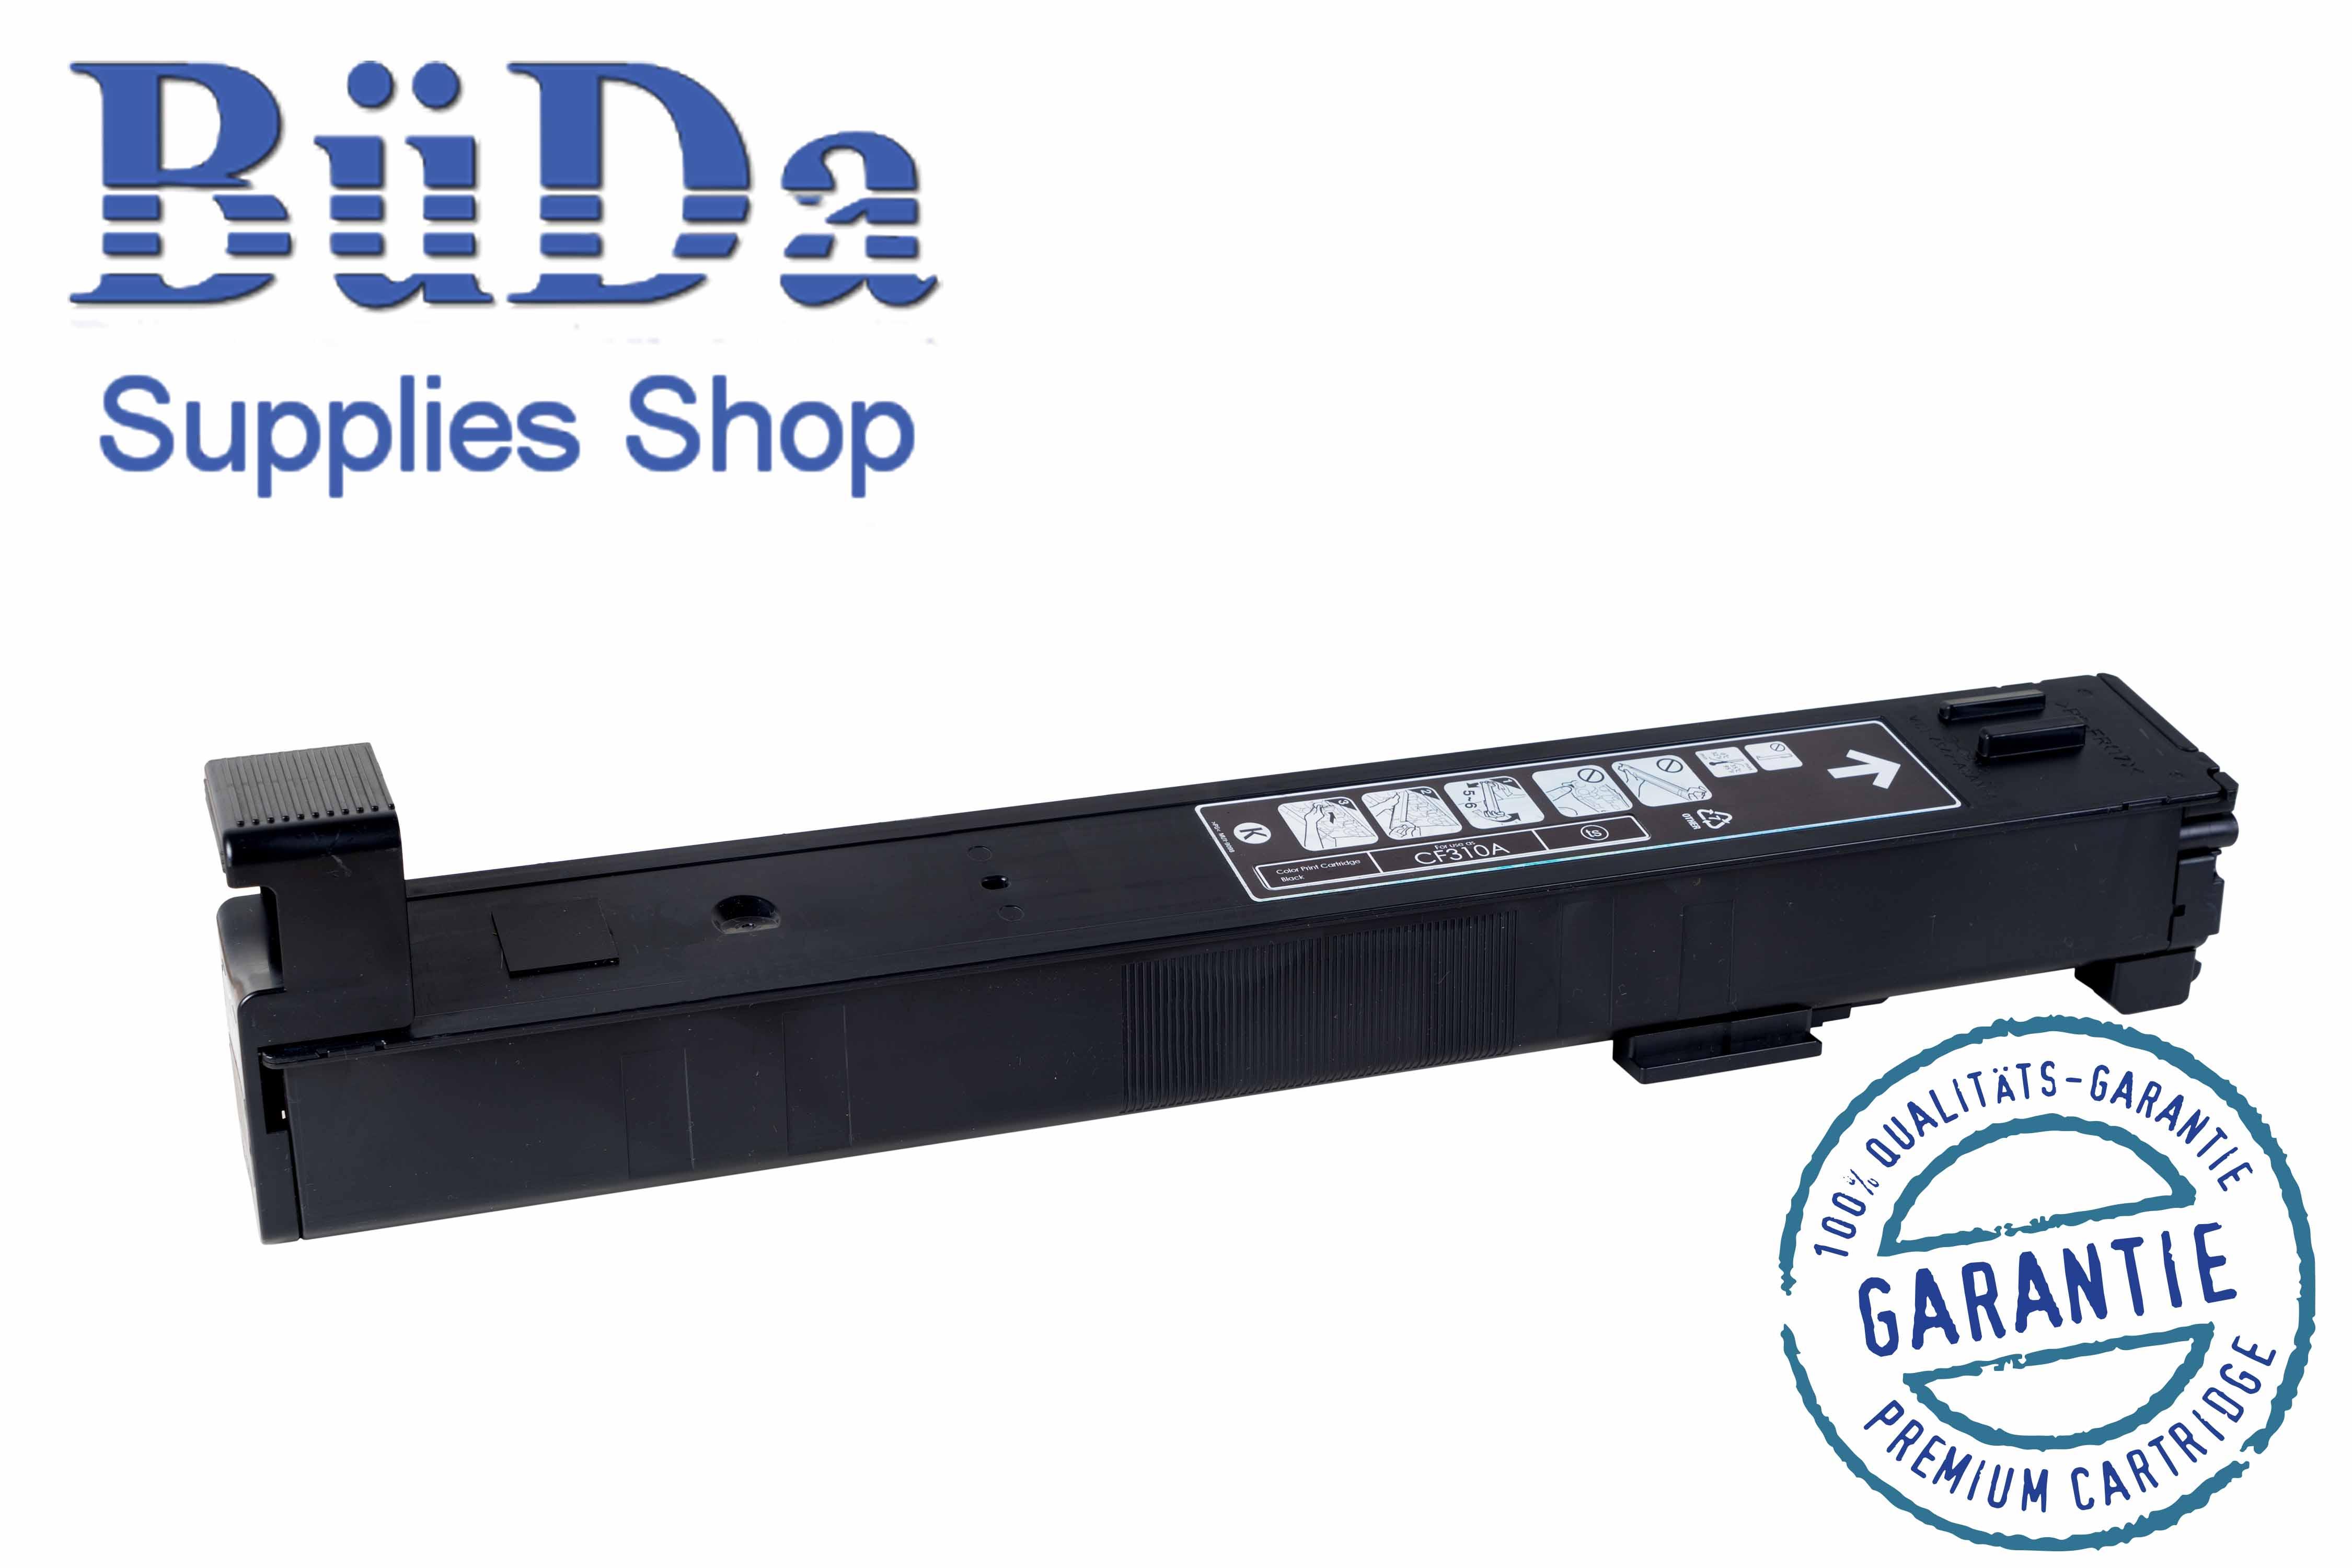 Toner-Modul komp. zu CF310A / 826A black 29000 Seiten